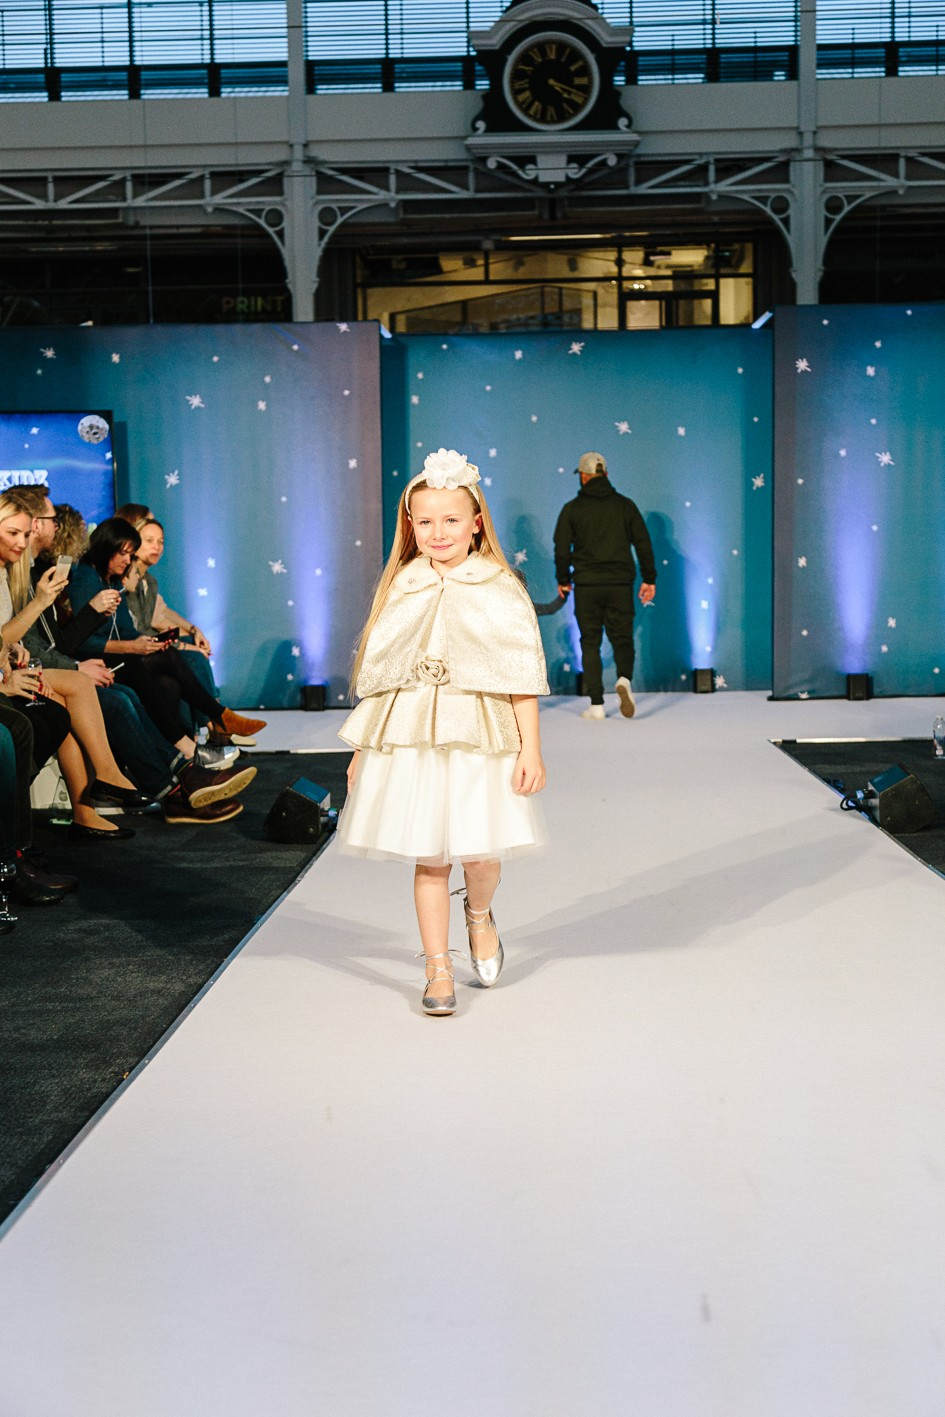 Harlow Luna White wearing Patachou